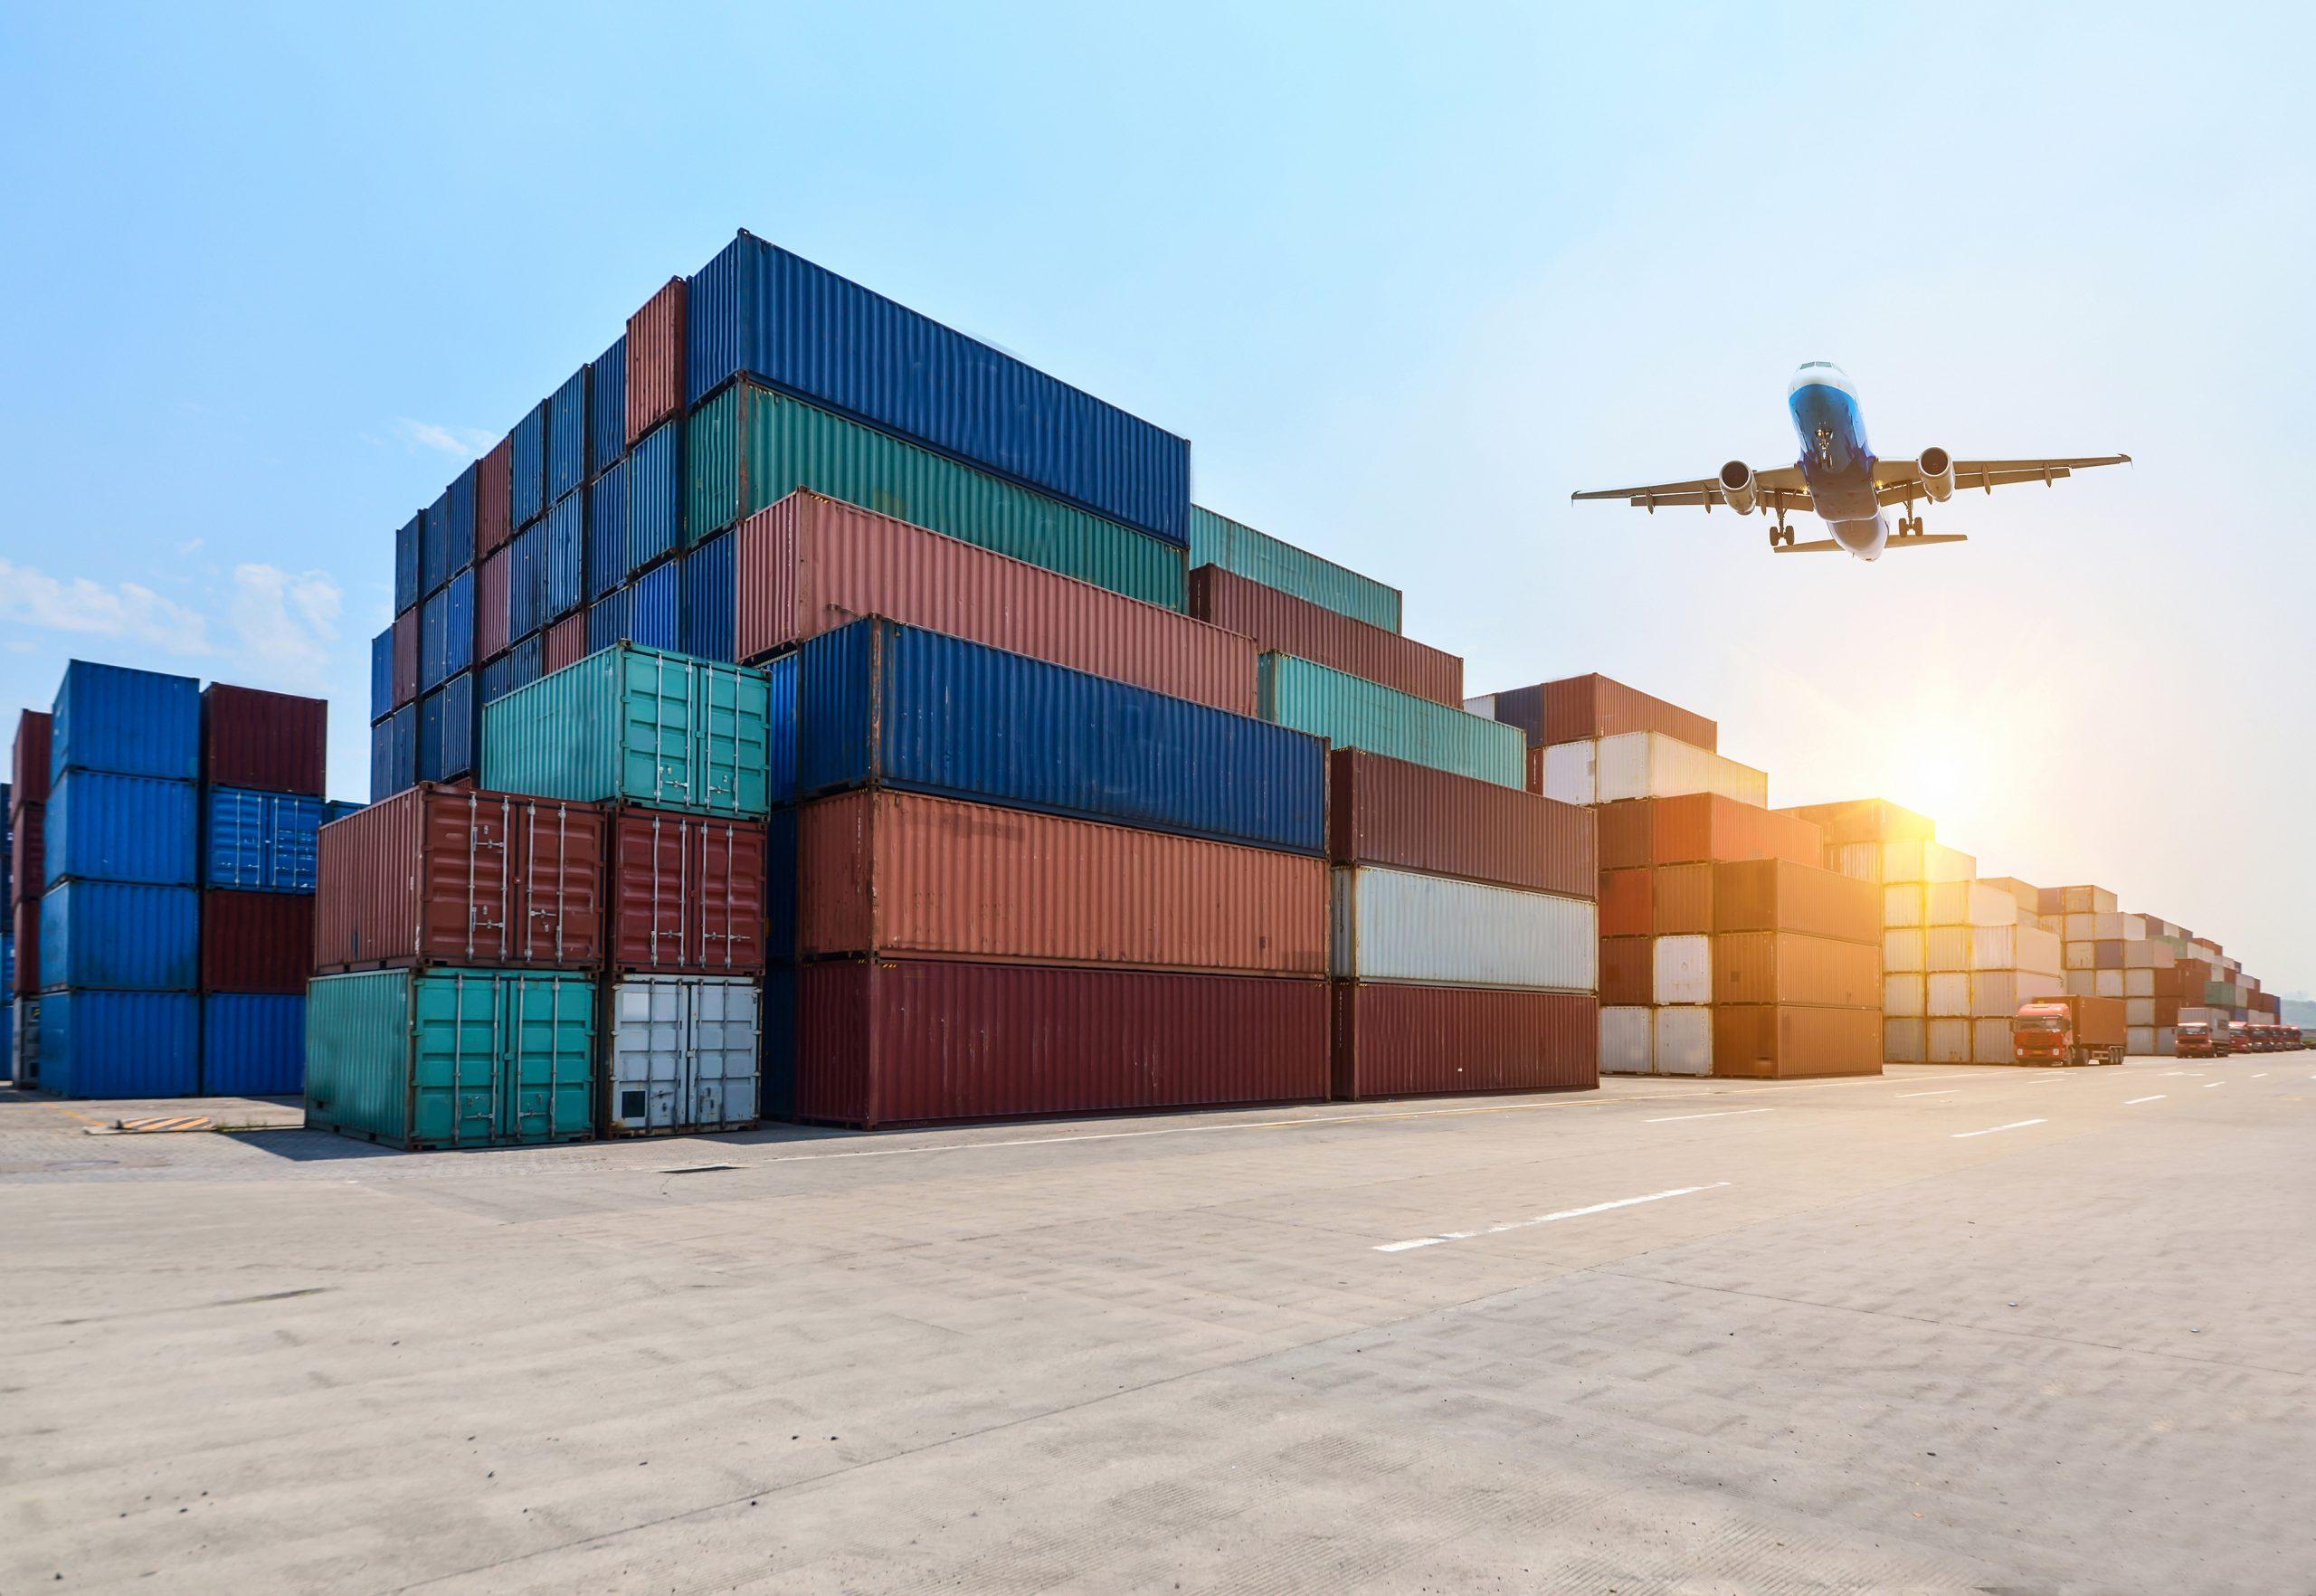 Mecanismo de Alerta de Obstáculos ao Comércio, por Jailson Semedo